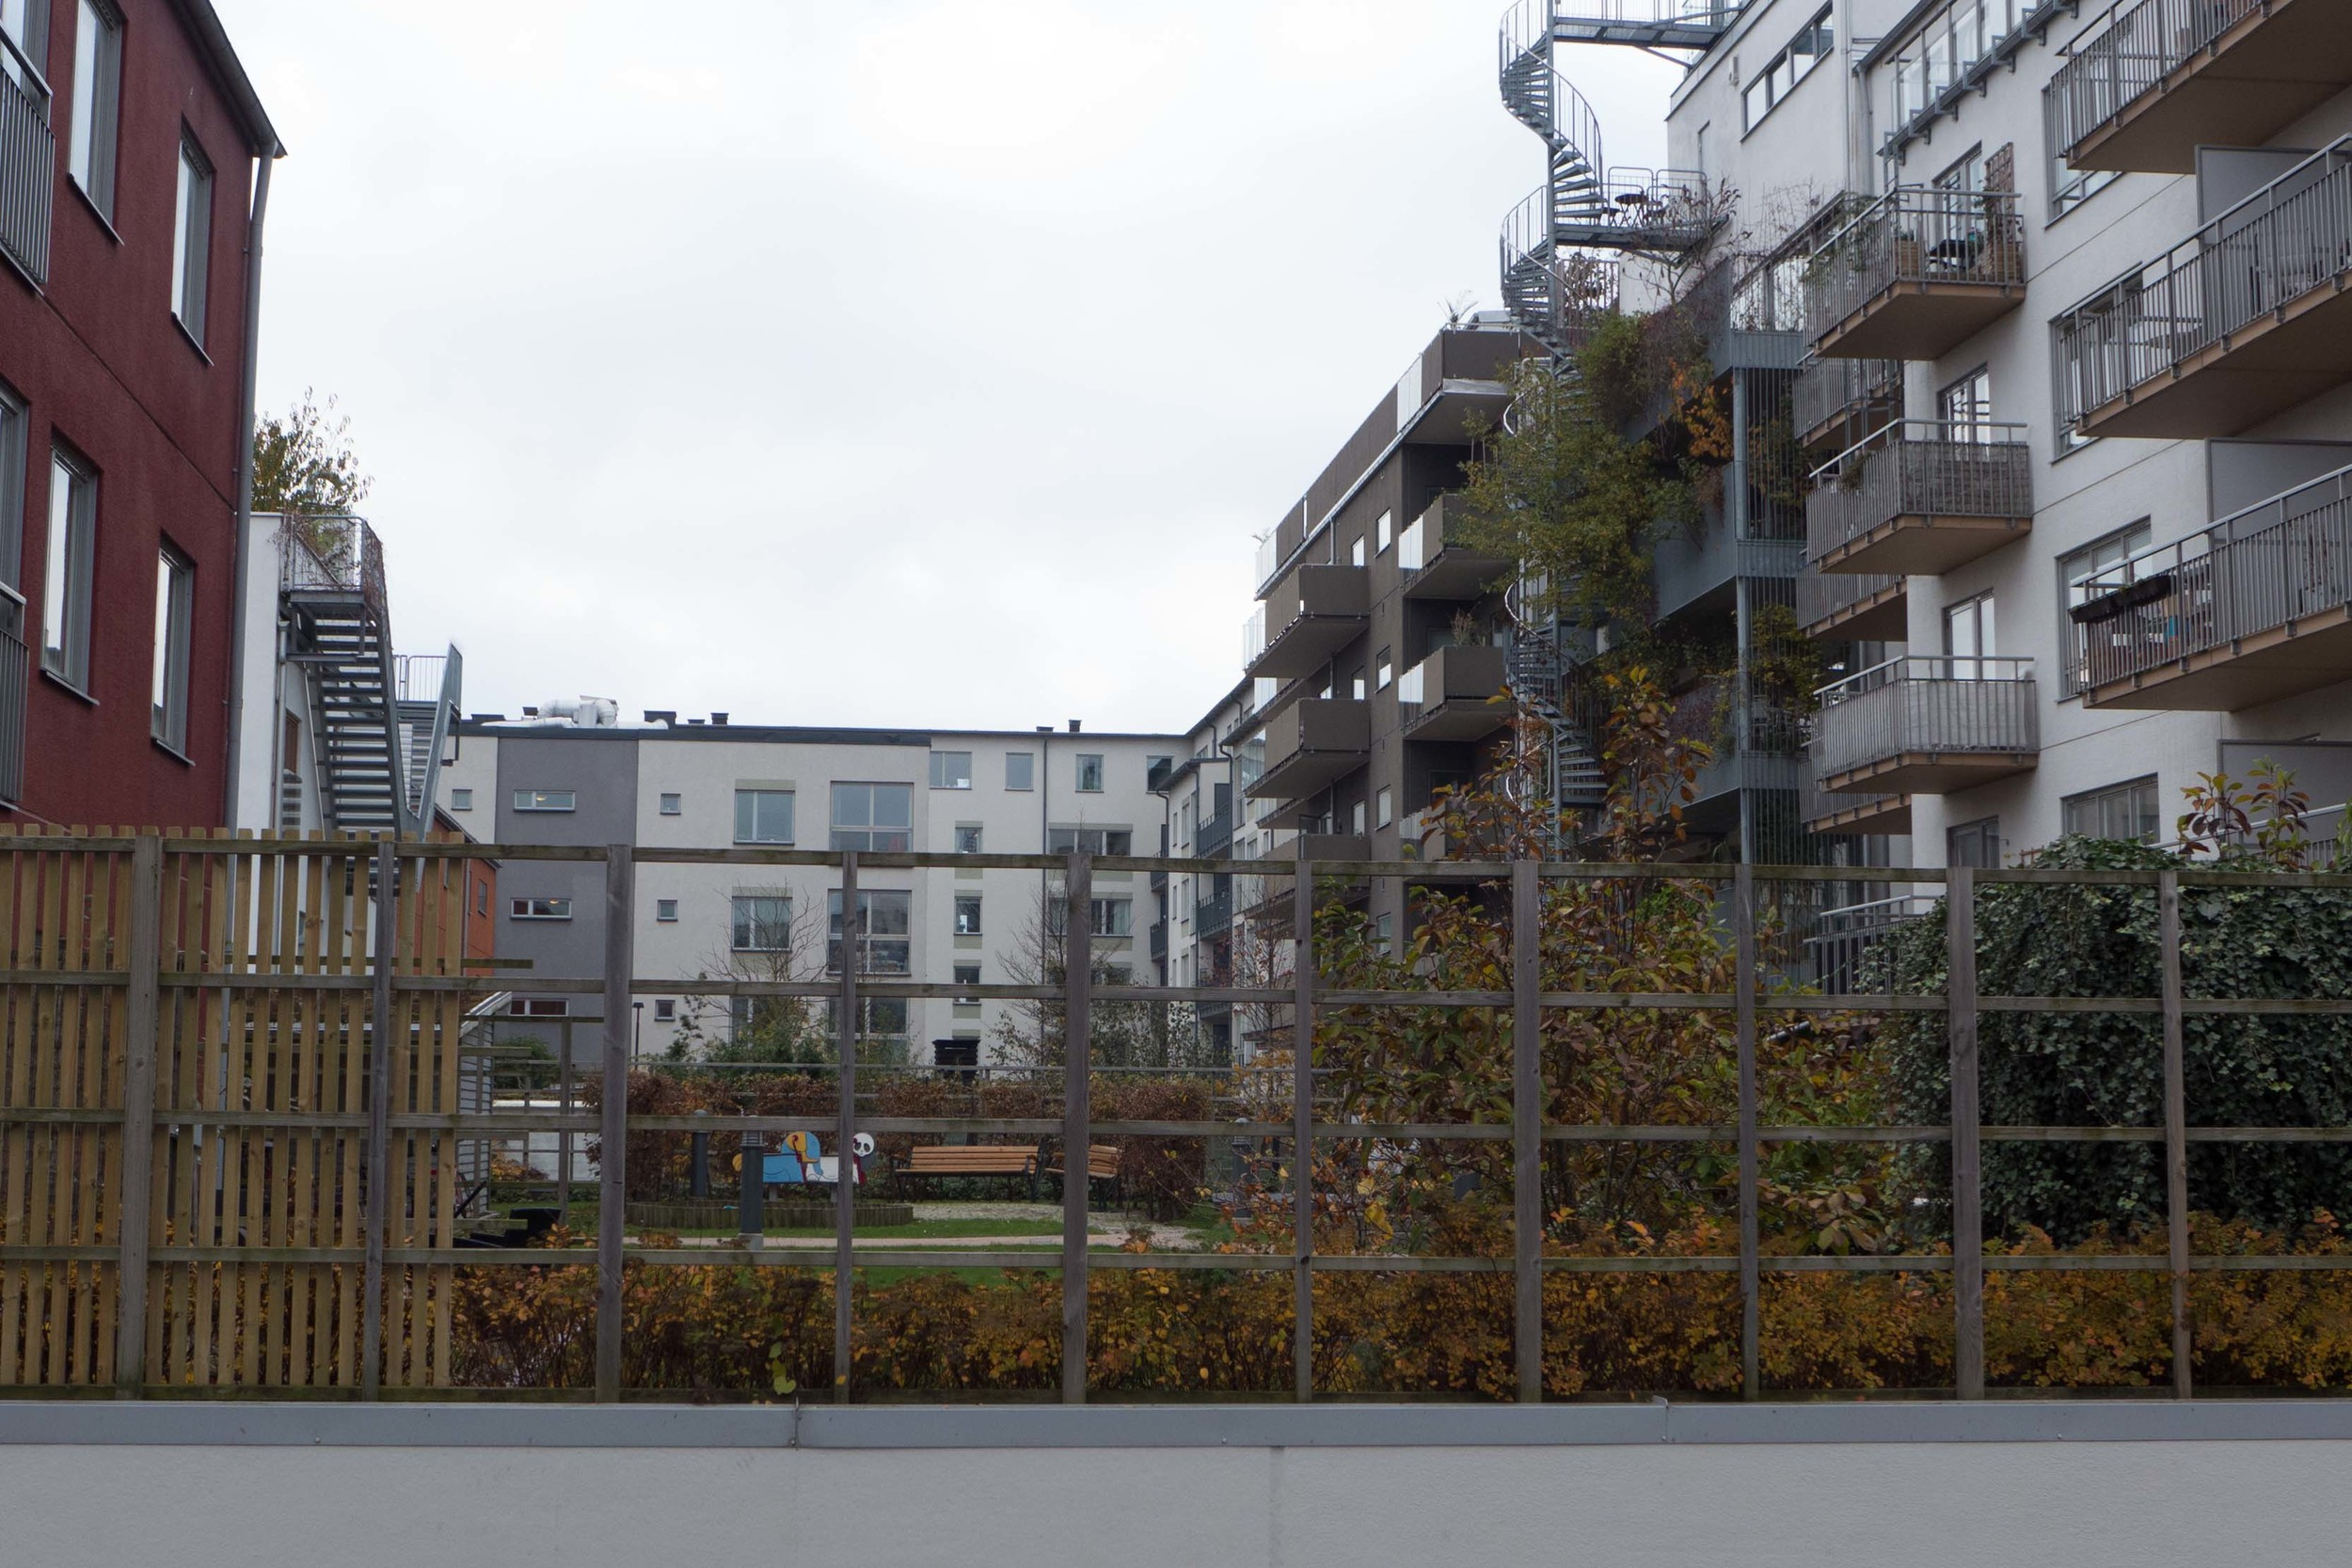 Malmo courtyard 4.jpg